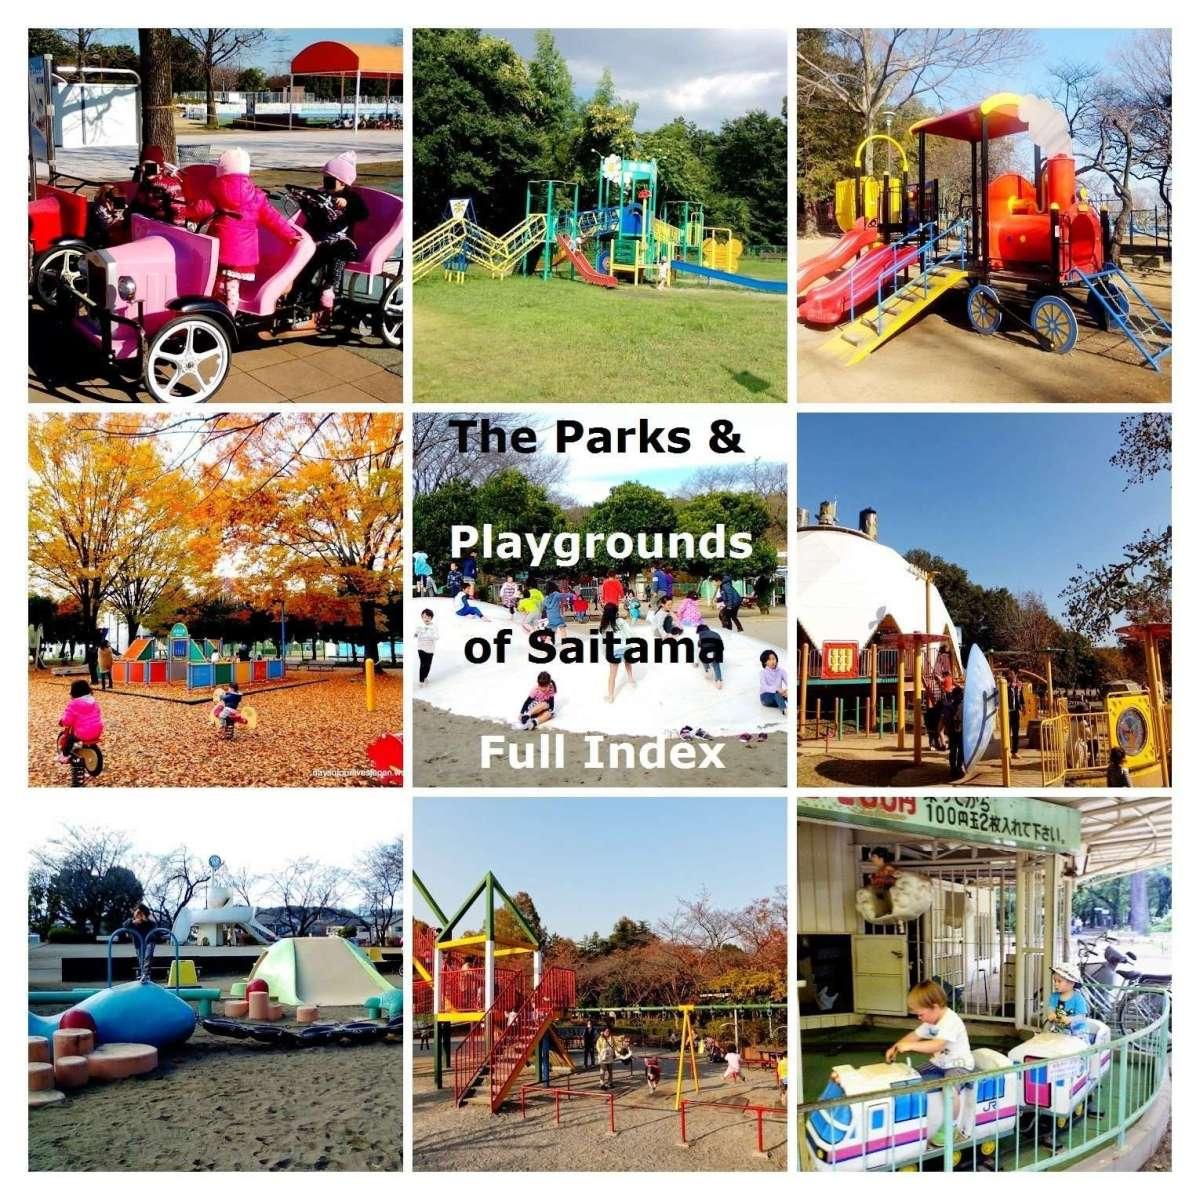 The Parks and Playgrounds of Saitama